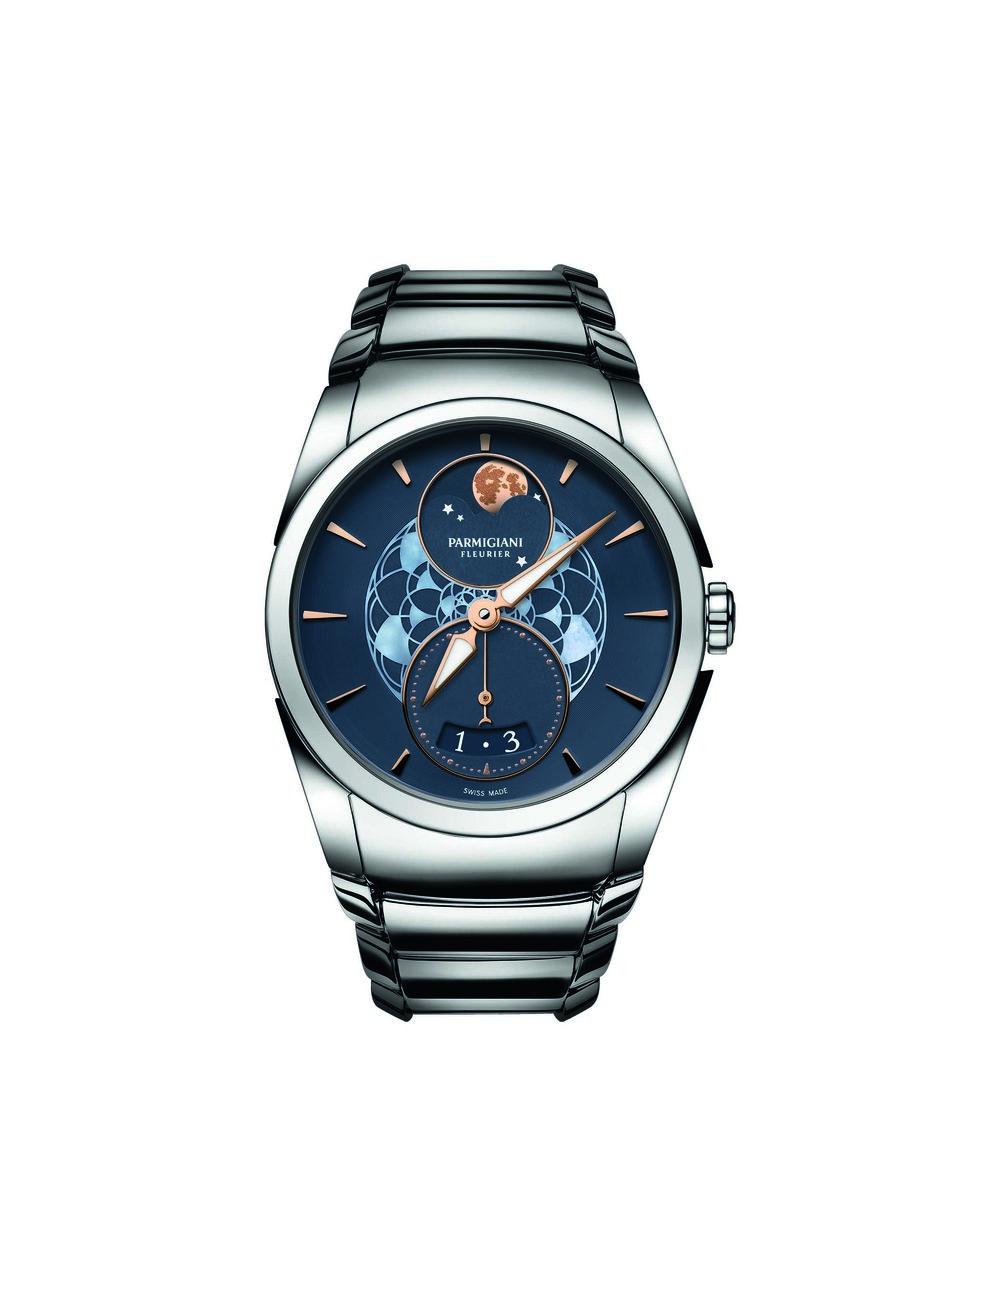 Tonda Metropolitaine Selene  帕瑪強尼Tonda系列「都市月之女神」女士腕錶於今年日內瓦鐘錶展(SIHH)上推出,機芯完全由帕瑪強尼獨自研發,造型簡約經典,但於細節處盡顯用心。錶盤上青銅打造的月亮呈現獨特的赤褐色,是月亮在特殊雲層條件下才會顯現的光暈。表面栩栩如生的隕石坑,又稱「月海」,為分層打磨描繪而成,手工技藝極為複雜。中央的蓮花圖案由兩層疊加的珍珠貝母雕刻而成,烘托出女性柔美的氣質。六點鐘位置為小秒針和日期顯示窗。雙發條盒,動力儲存50小時。防水30米。另有白色錶盤和皮質錶帶款可供選擇。  At Palladio, (604) 685-3885, parmigiani.com